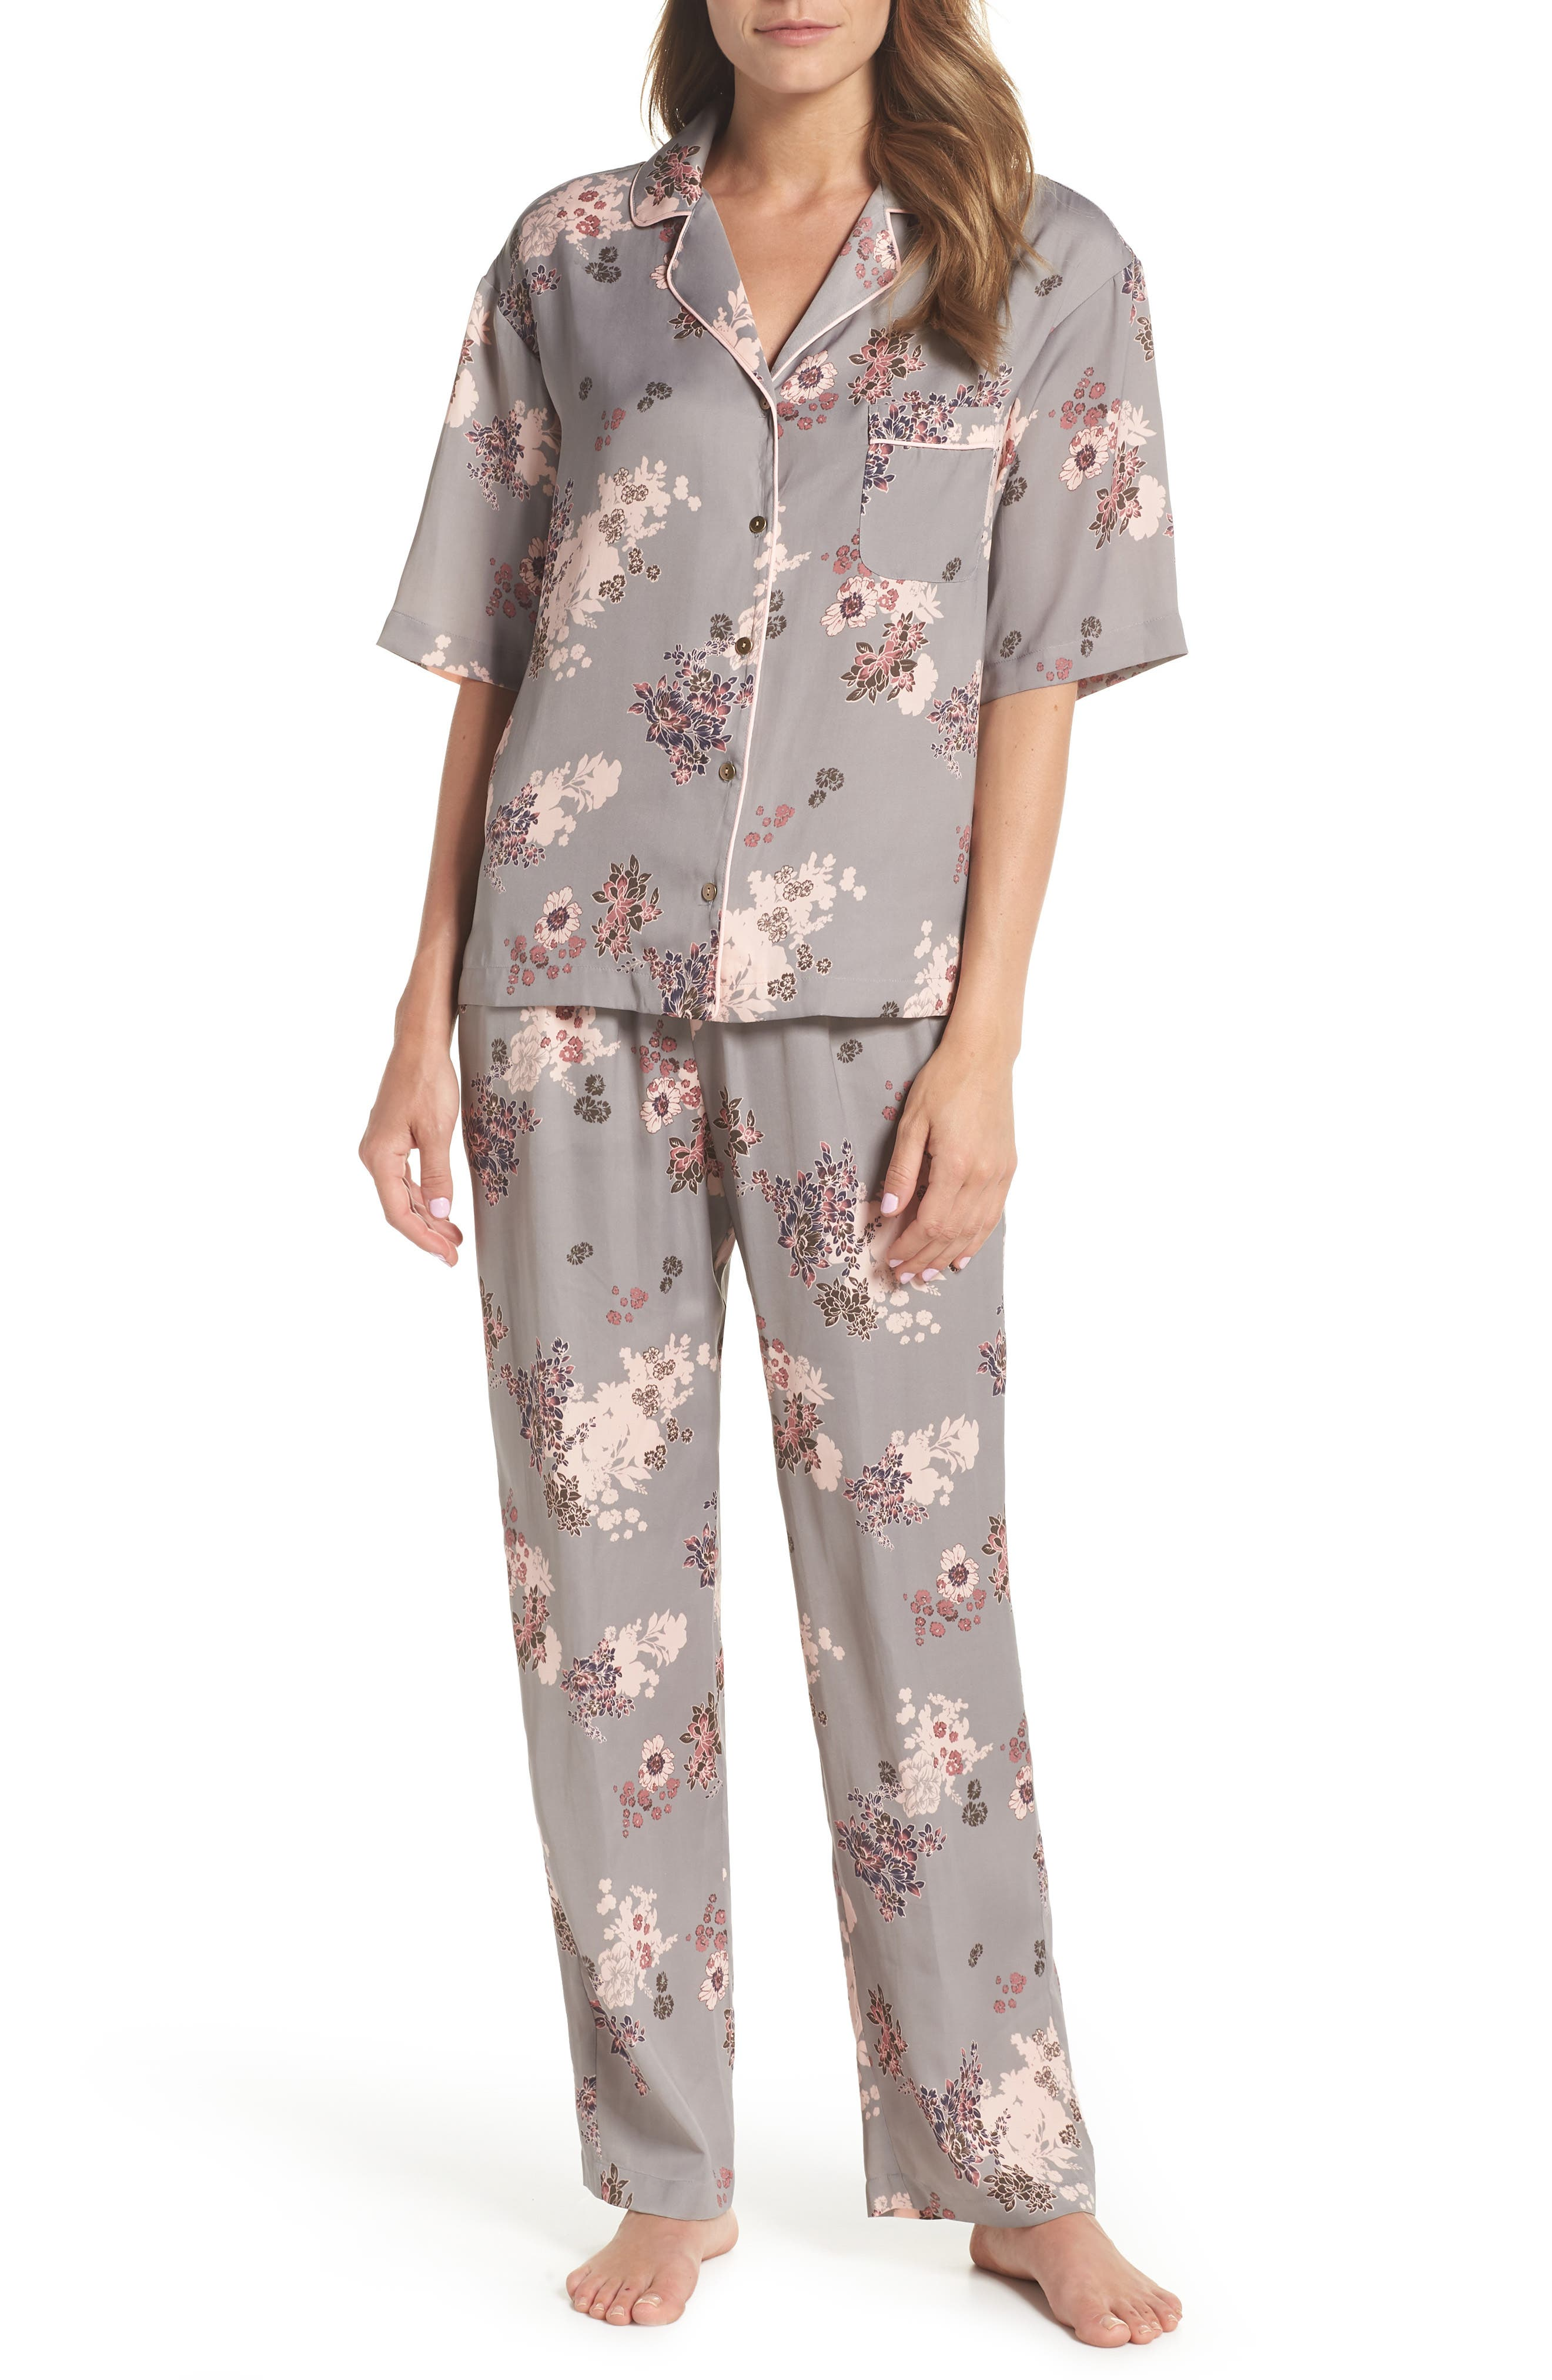 NORDSTROM LINGERIE Matte Satin Pajamas, Main, color, 030